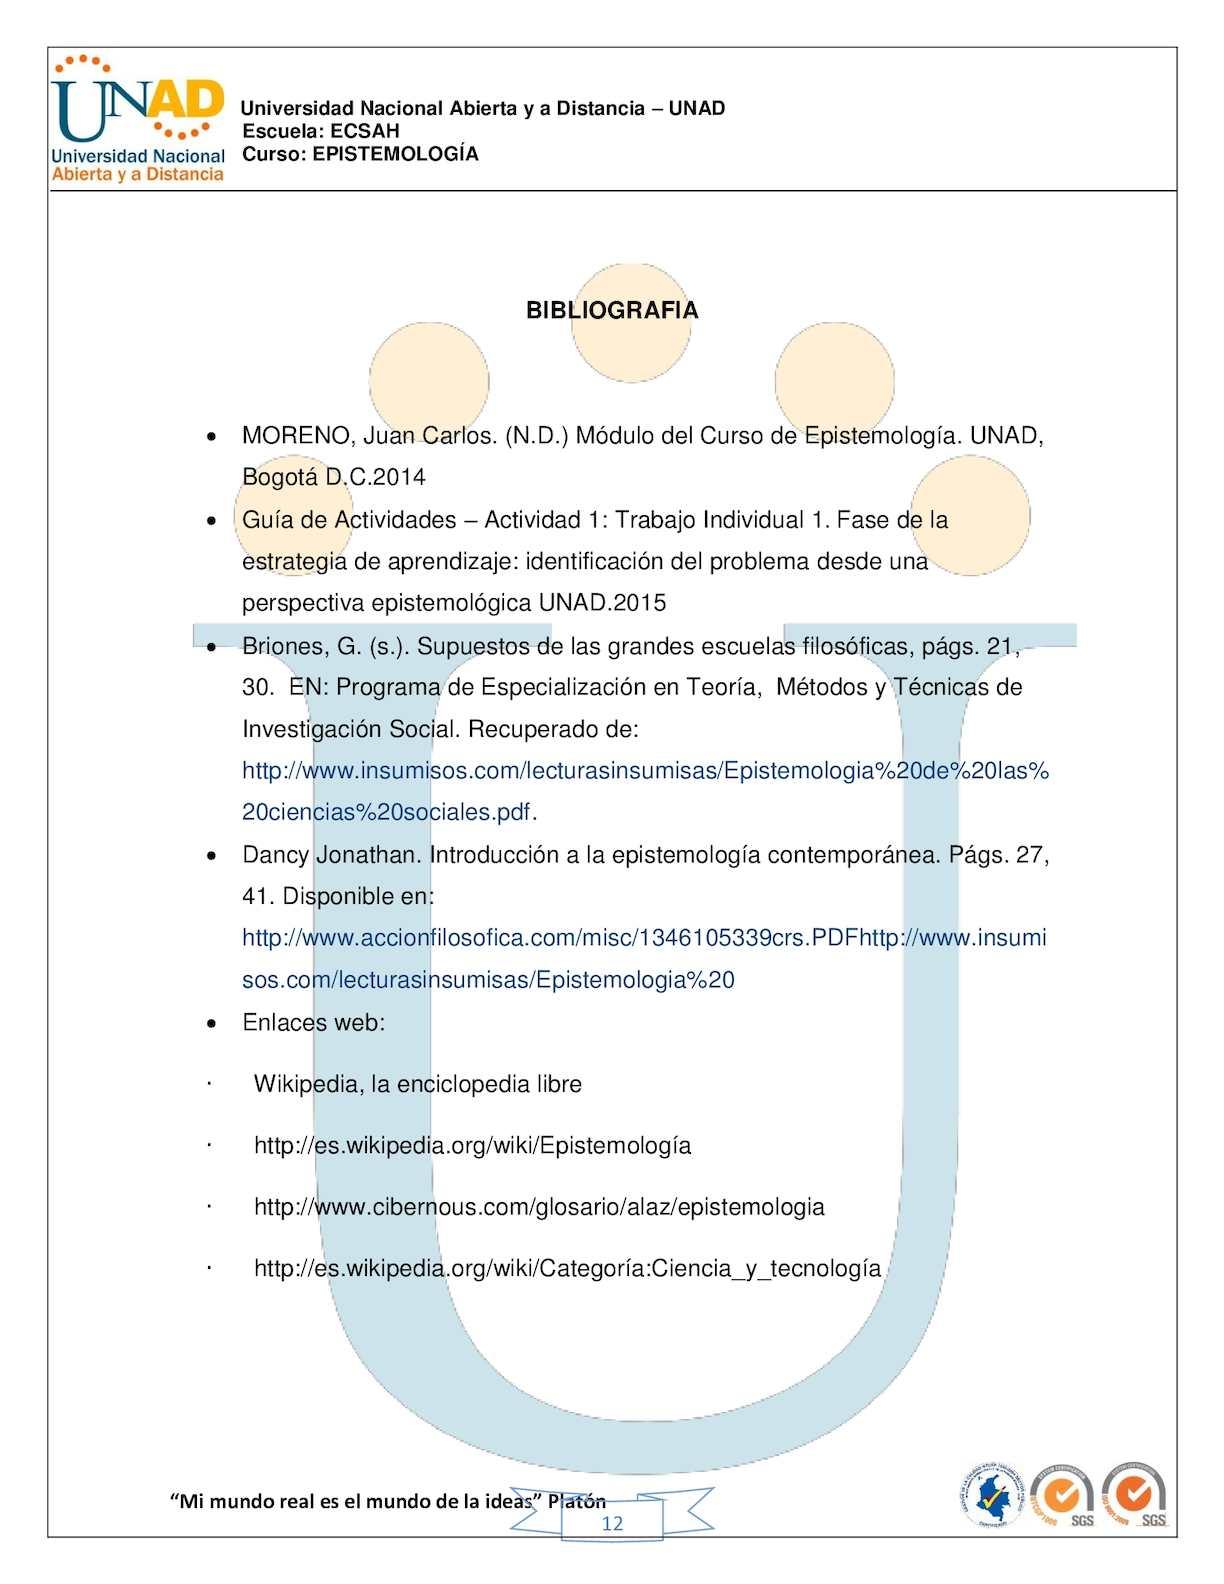 Parte 1 Epistemológia Calameo Downloader